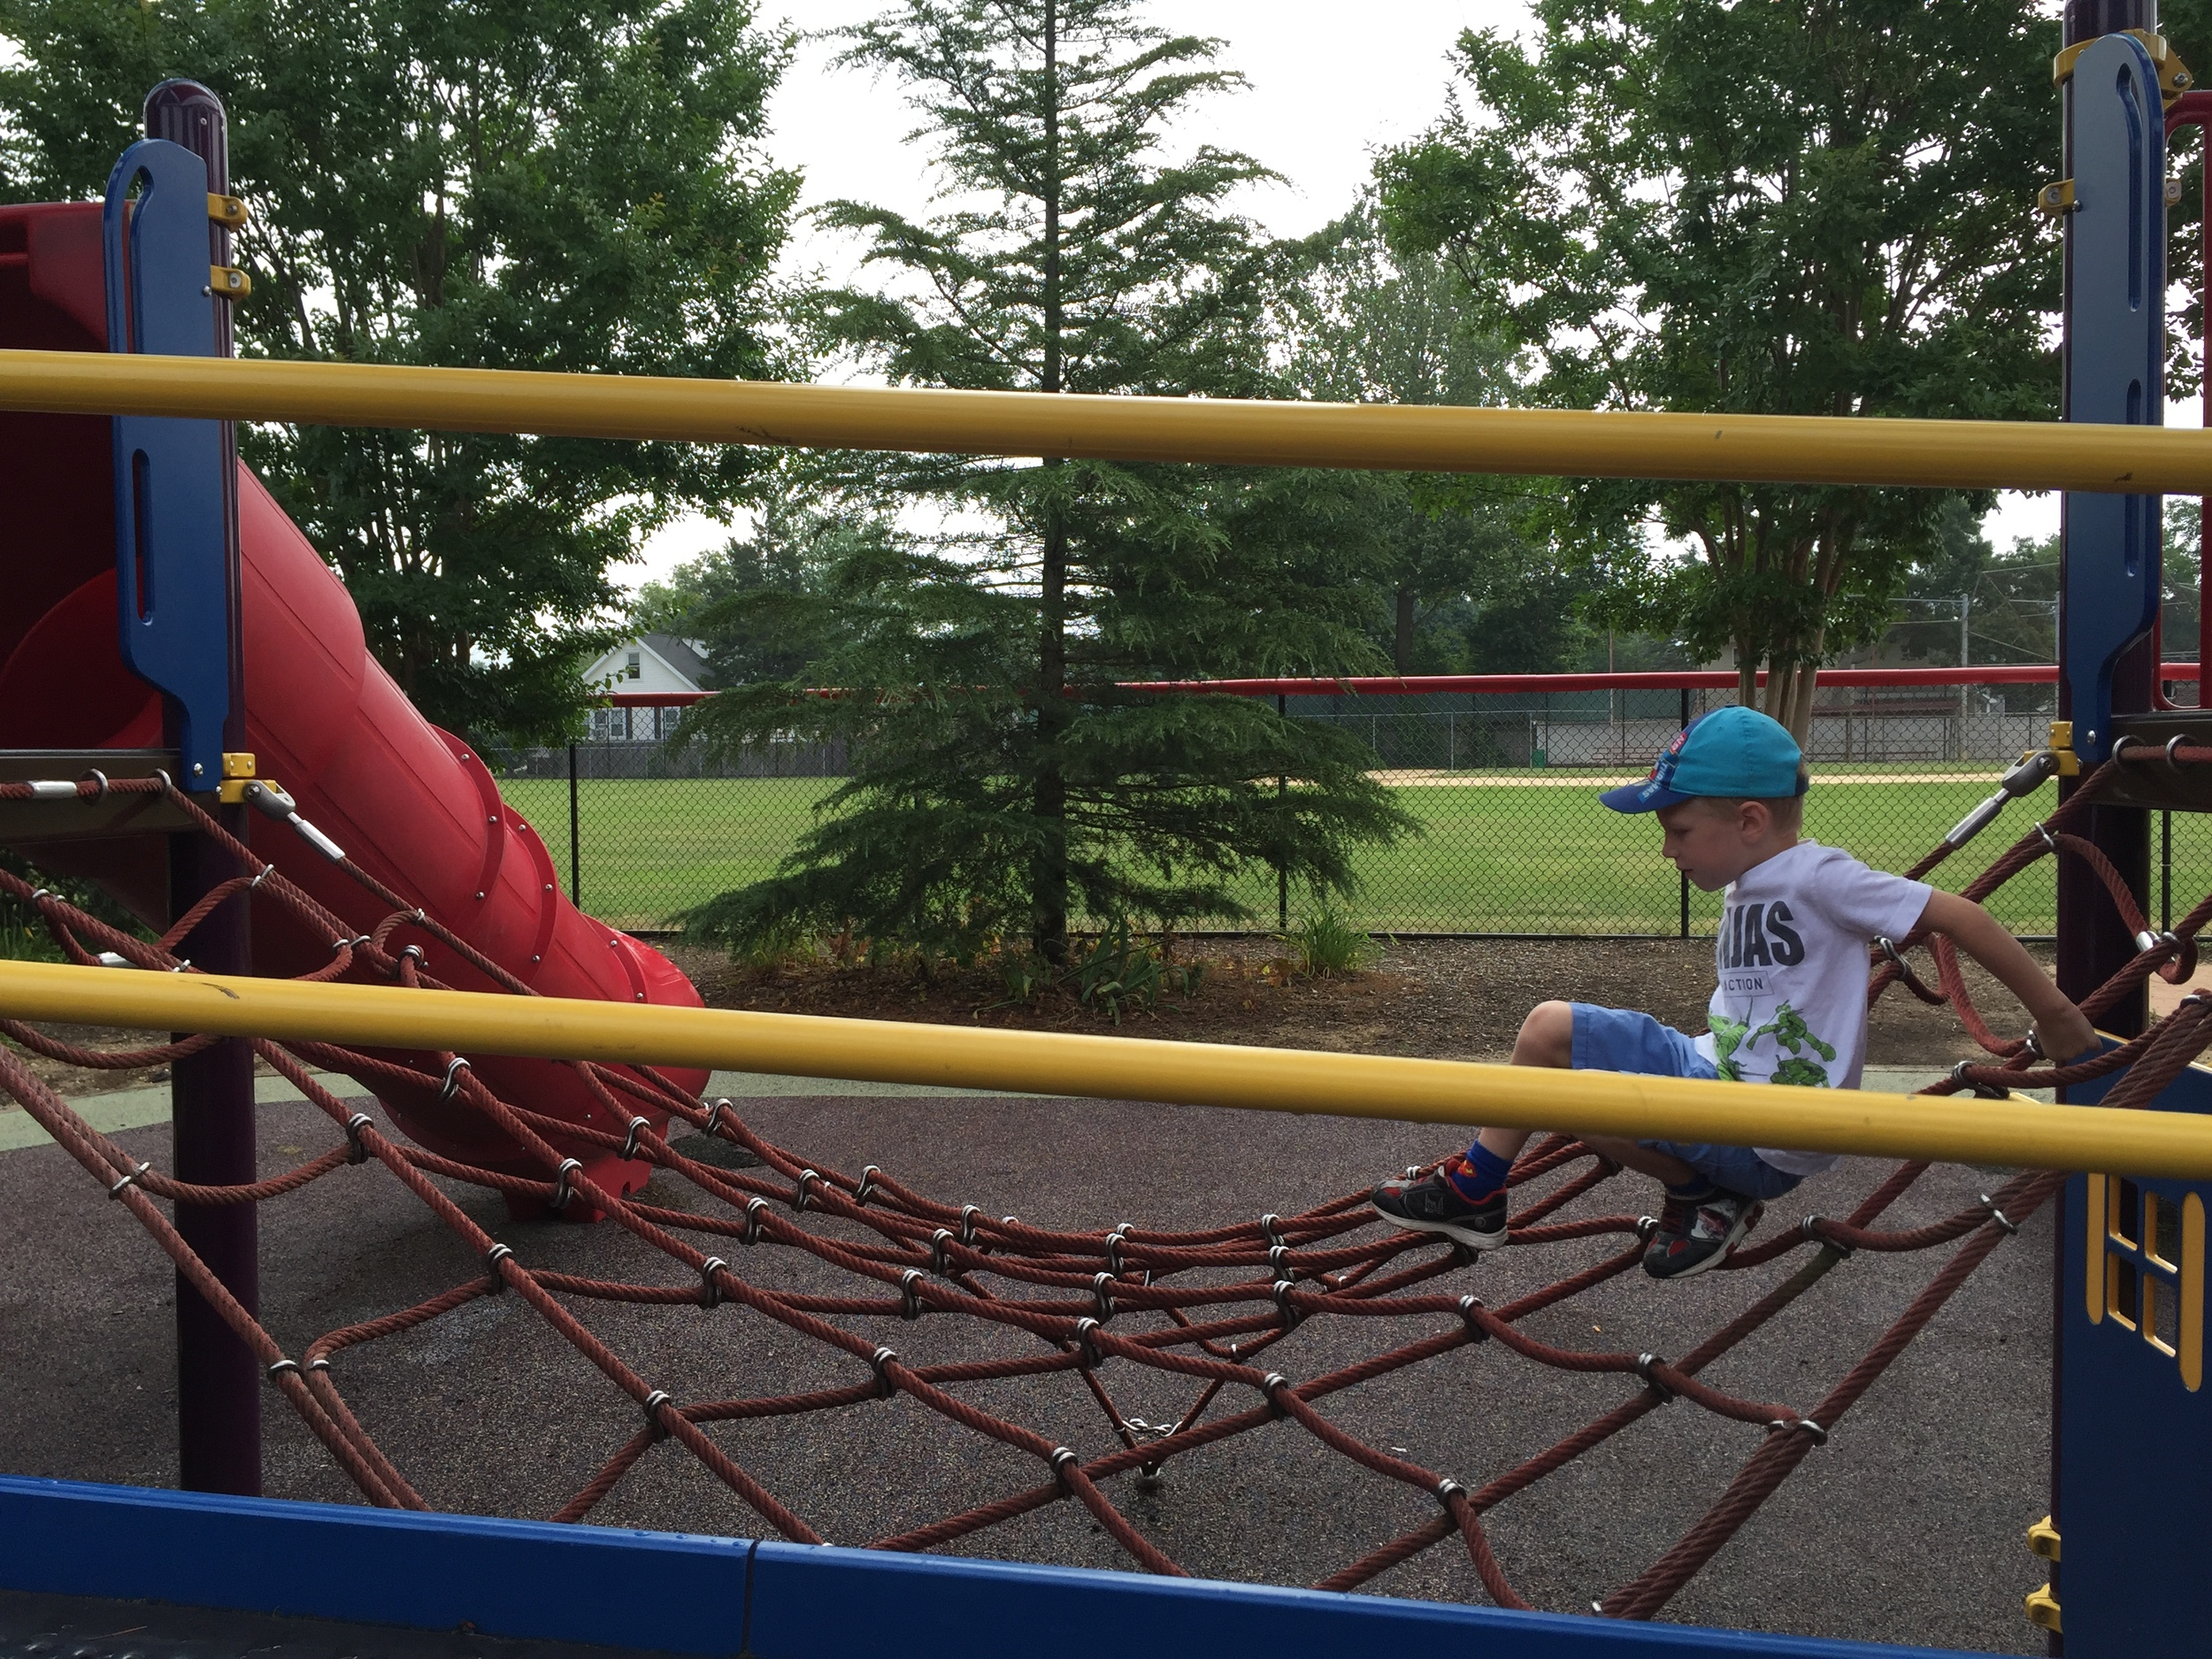 Rope climb at Pine Acres Playground